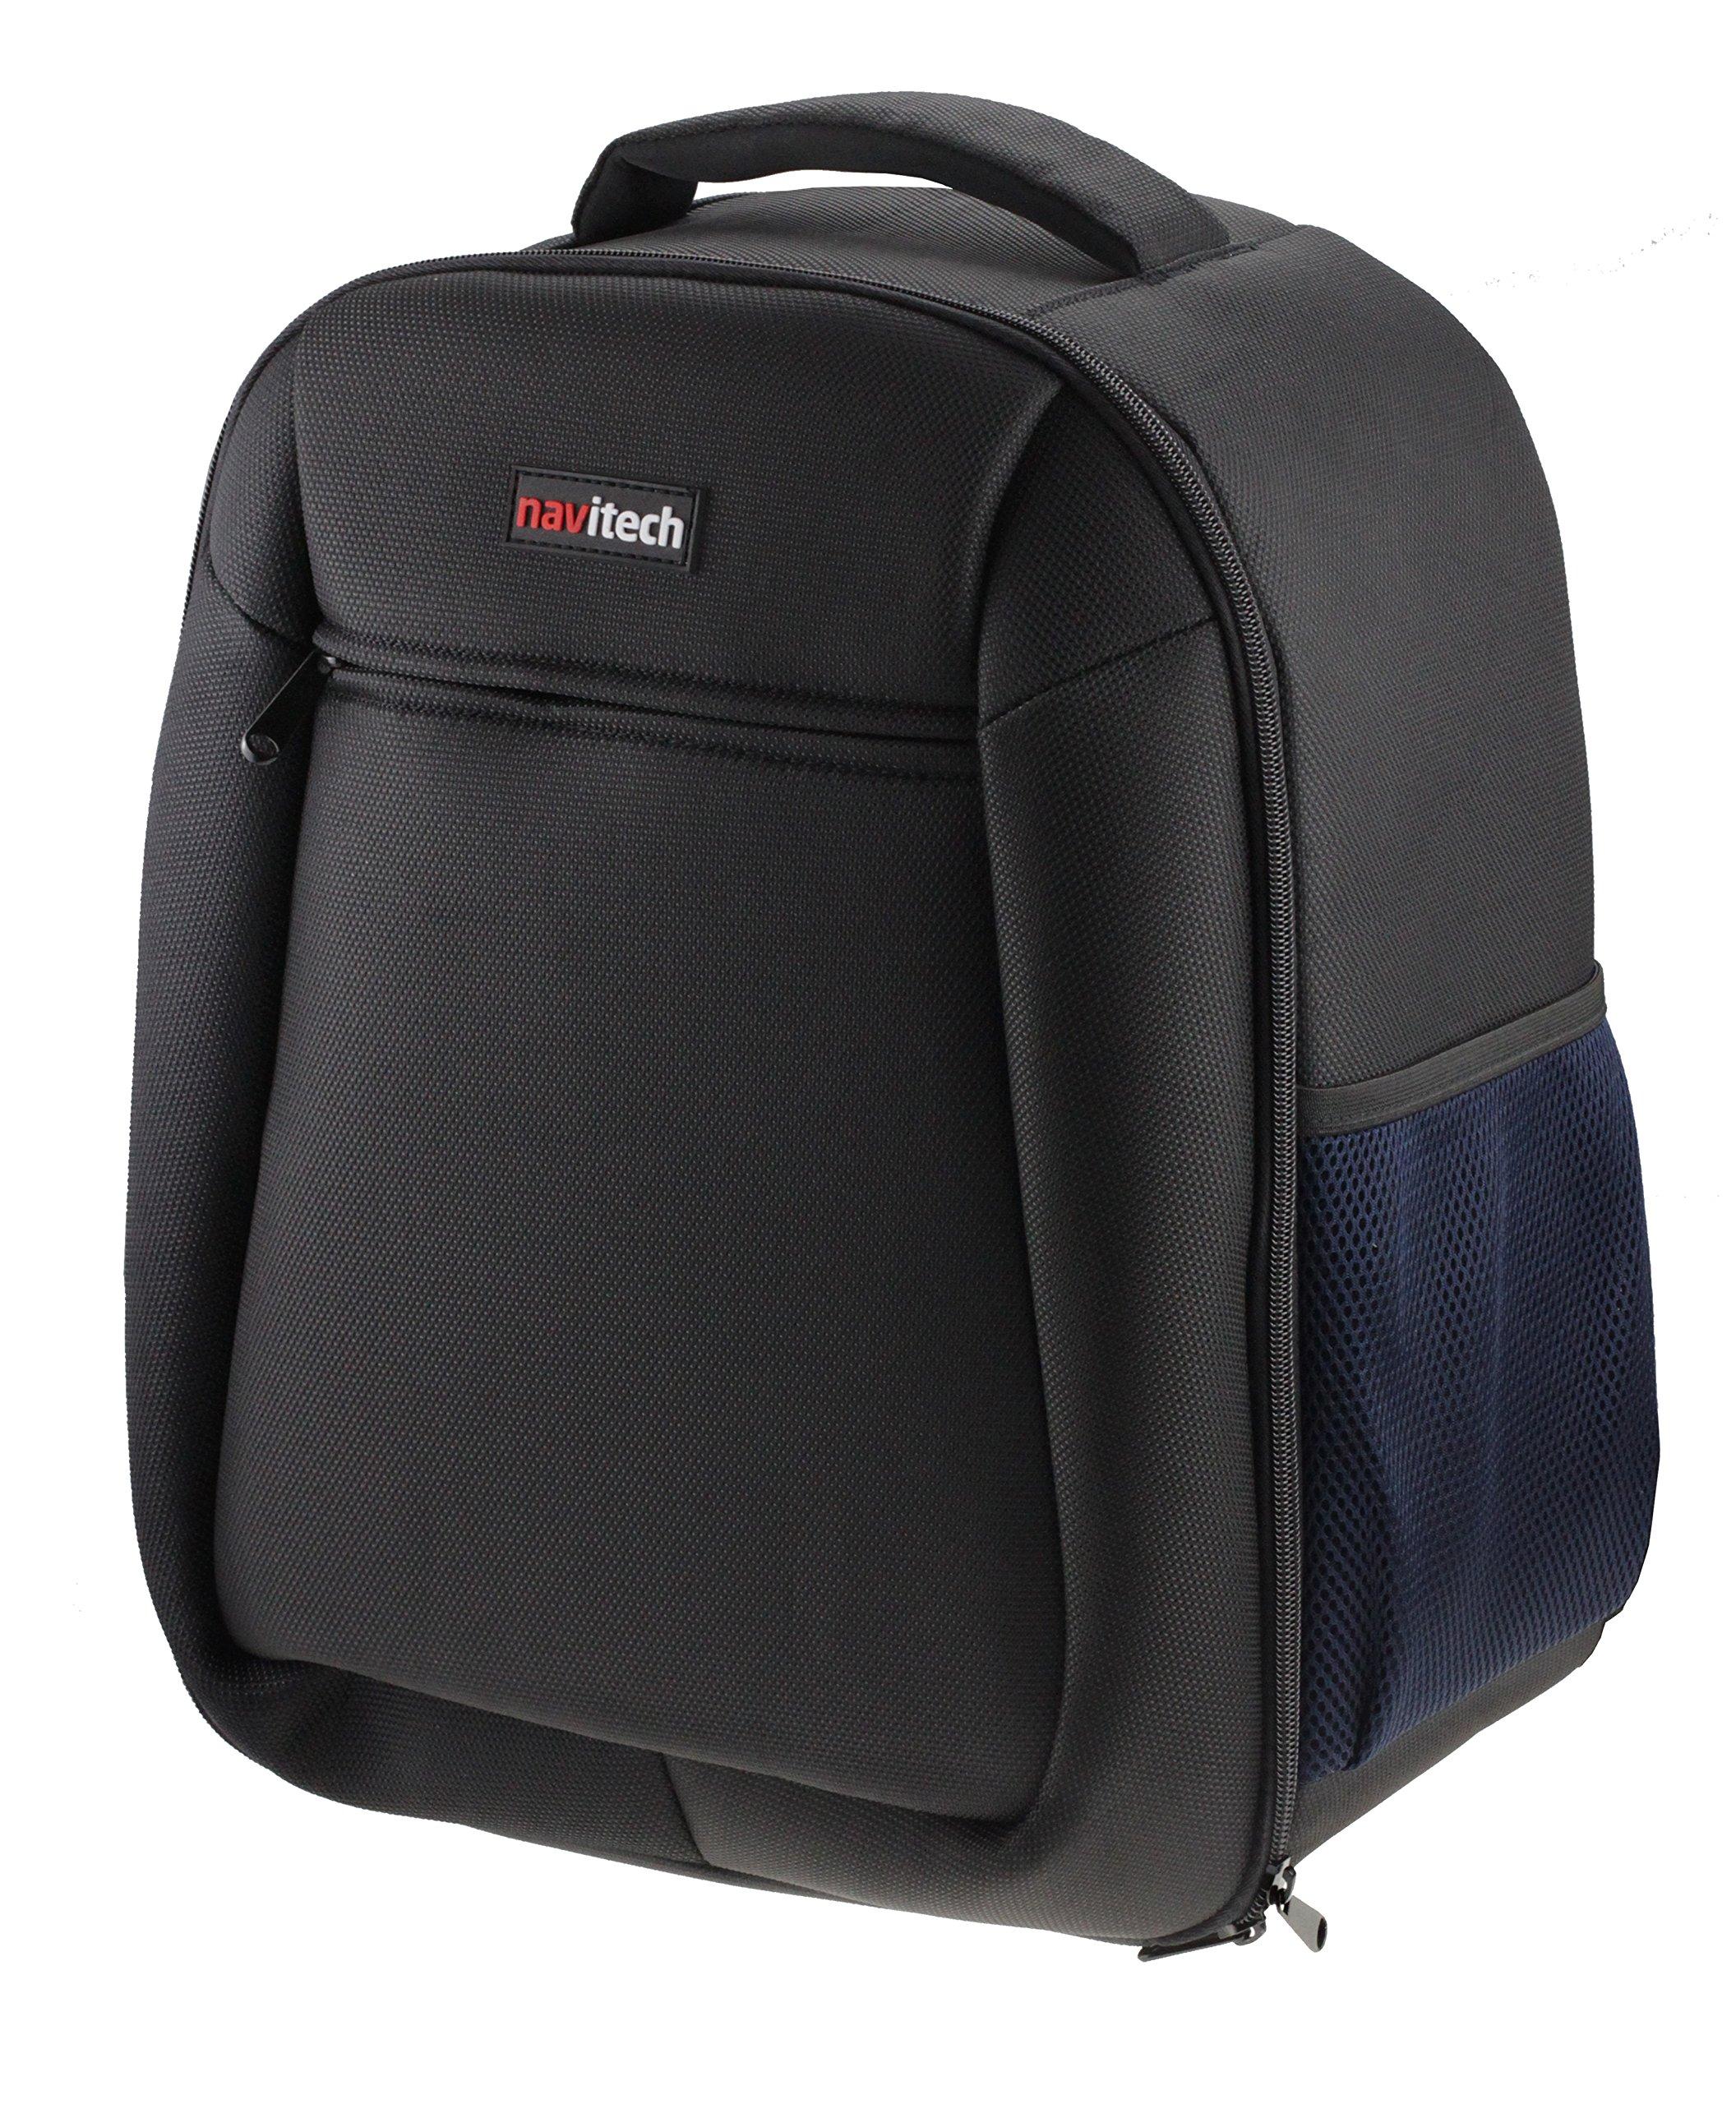 Navitech Rugged Black Backpack/Rucksack for The Oculus Rift + Oculus Touch Controller by Navitech (Image #2)